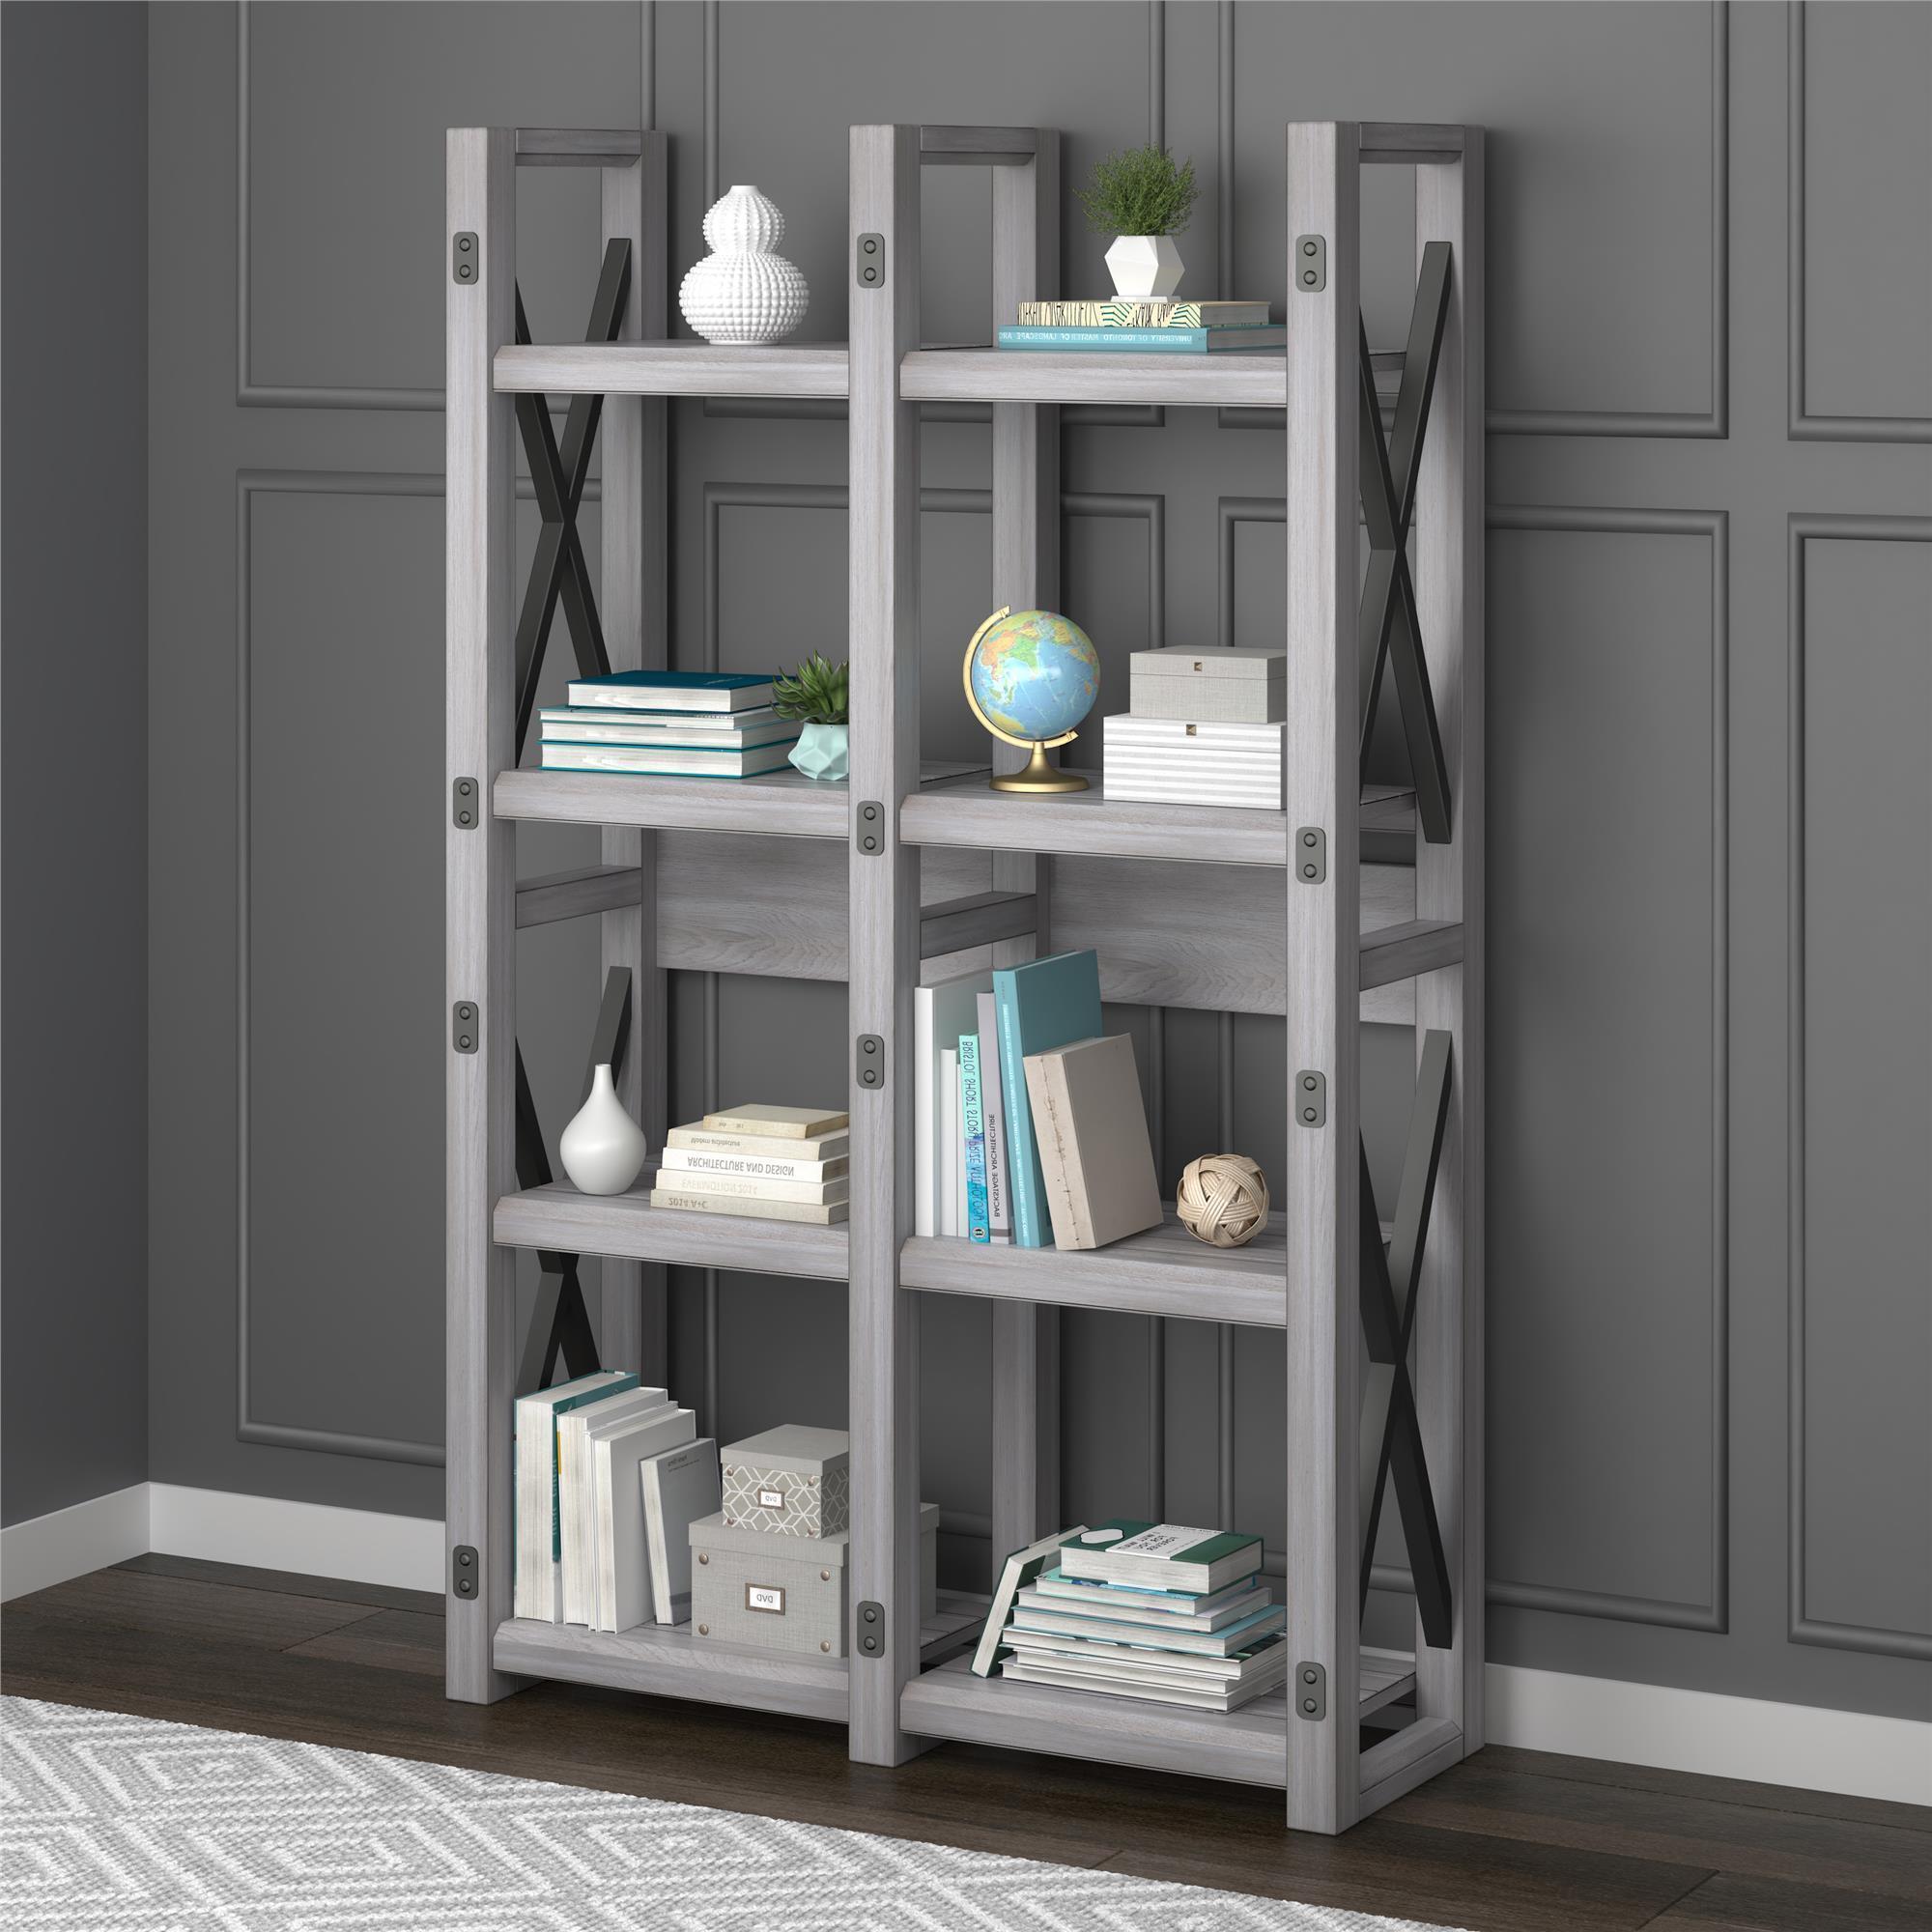 Shop Avenue Greene Woodgate Rustic White Bookcase Room Divider